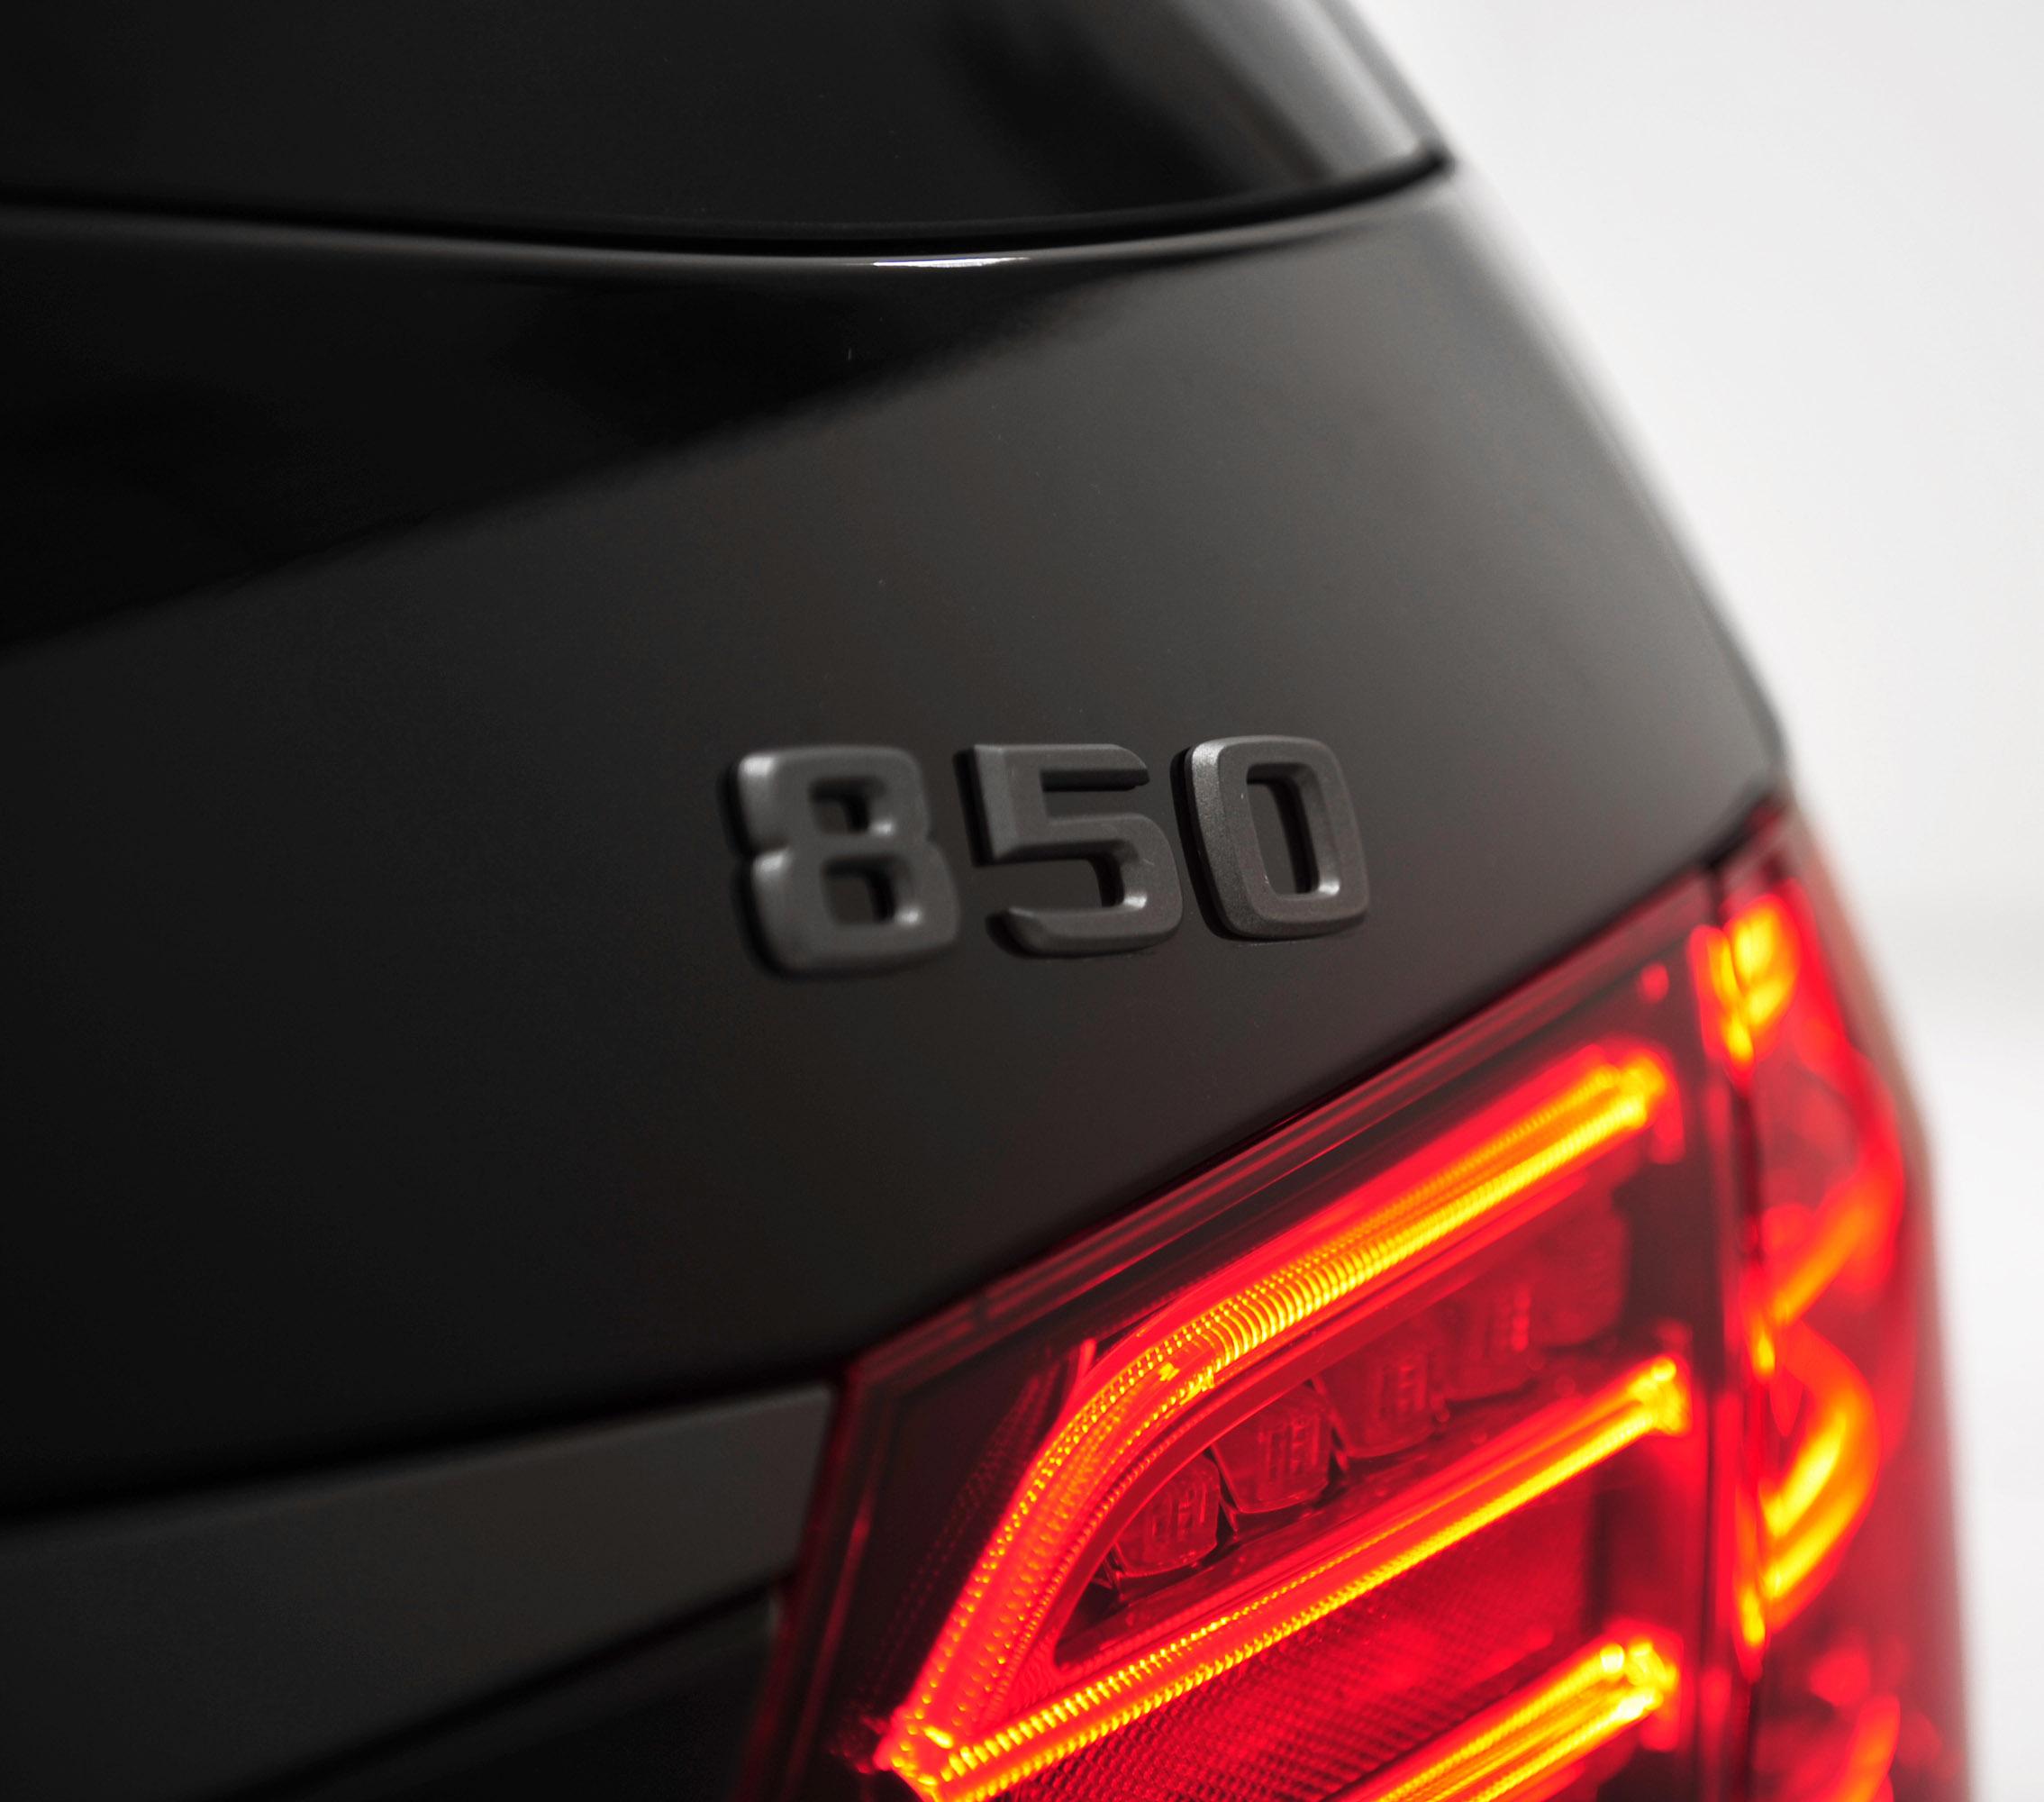 Brabus 850 6 0 Biturbo Mercedes Benz E63 Amg Picture 91897